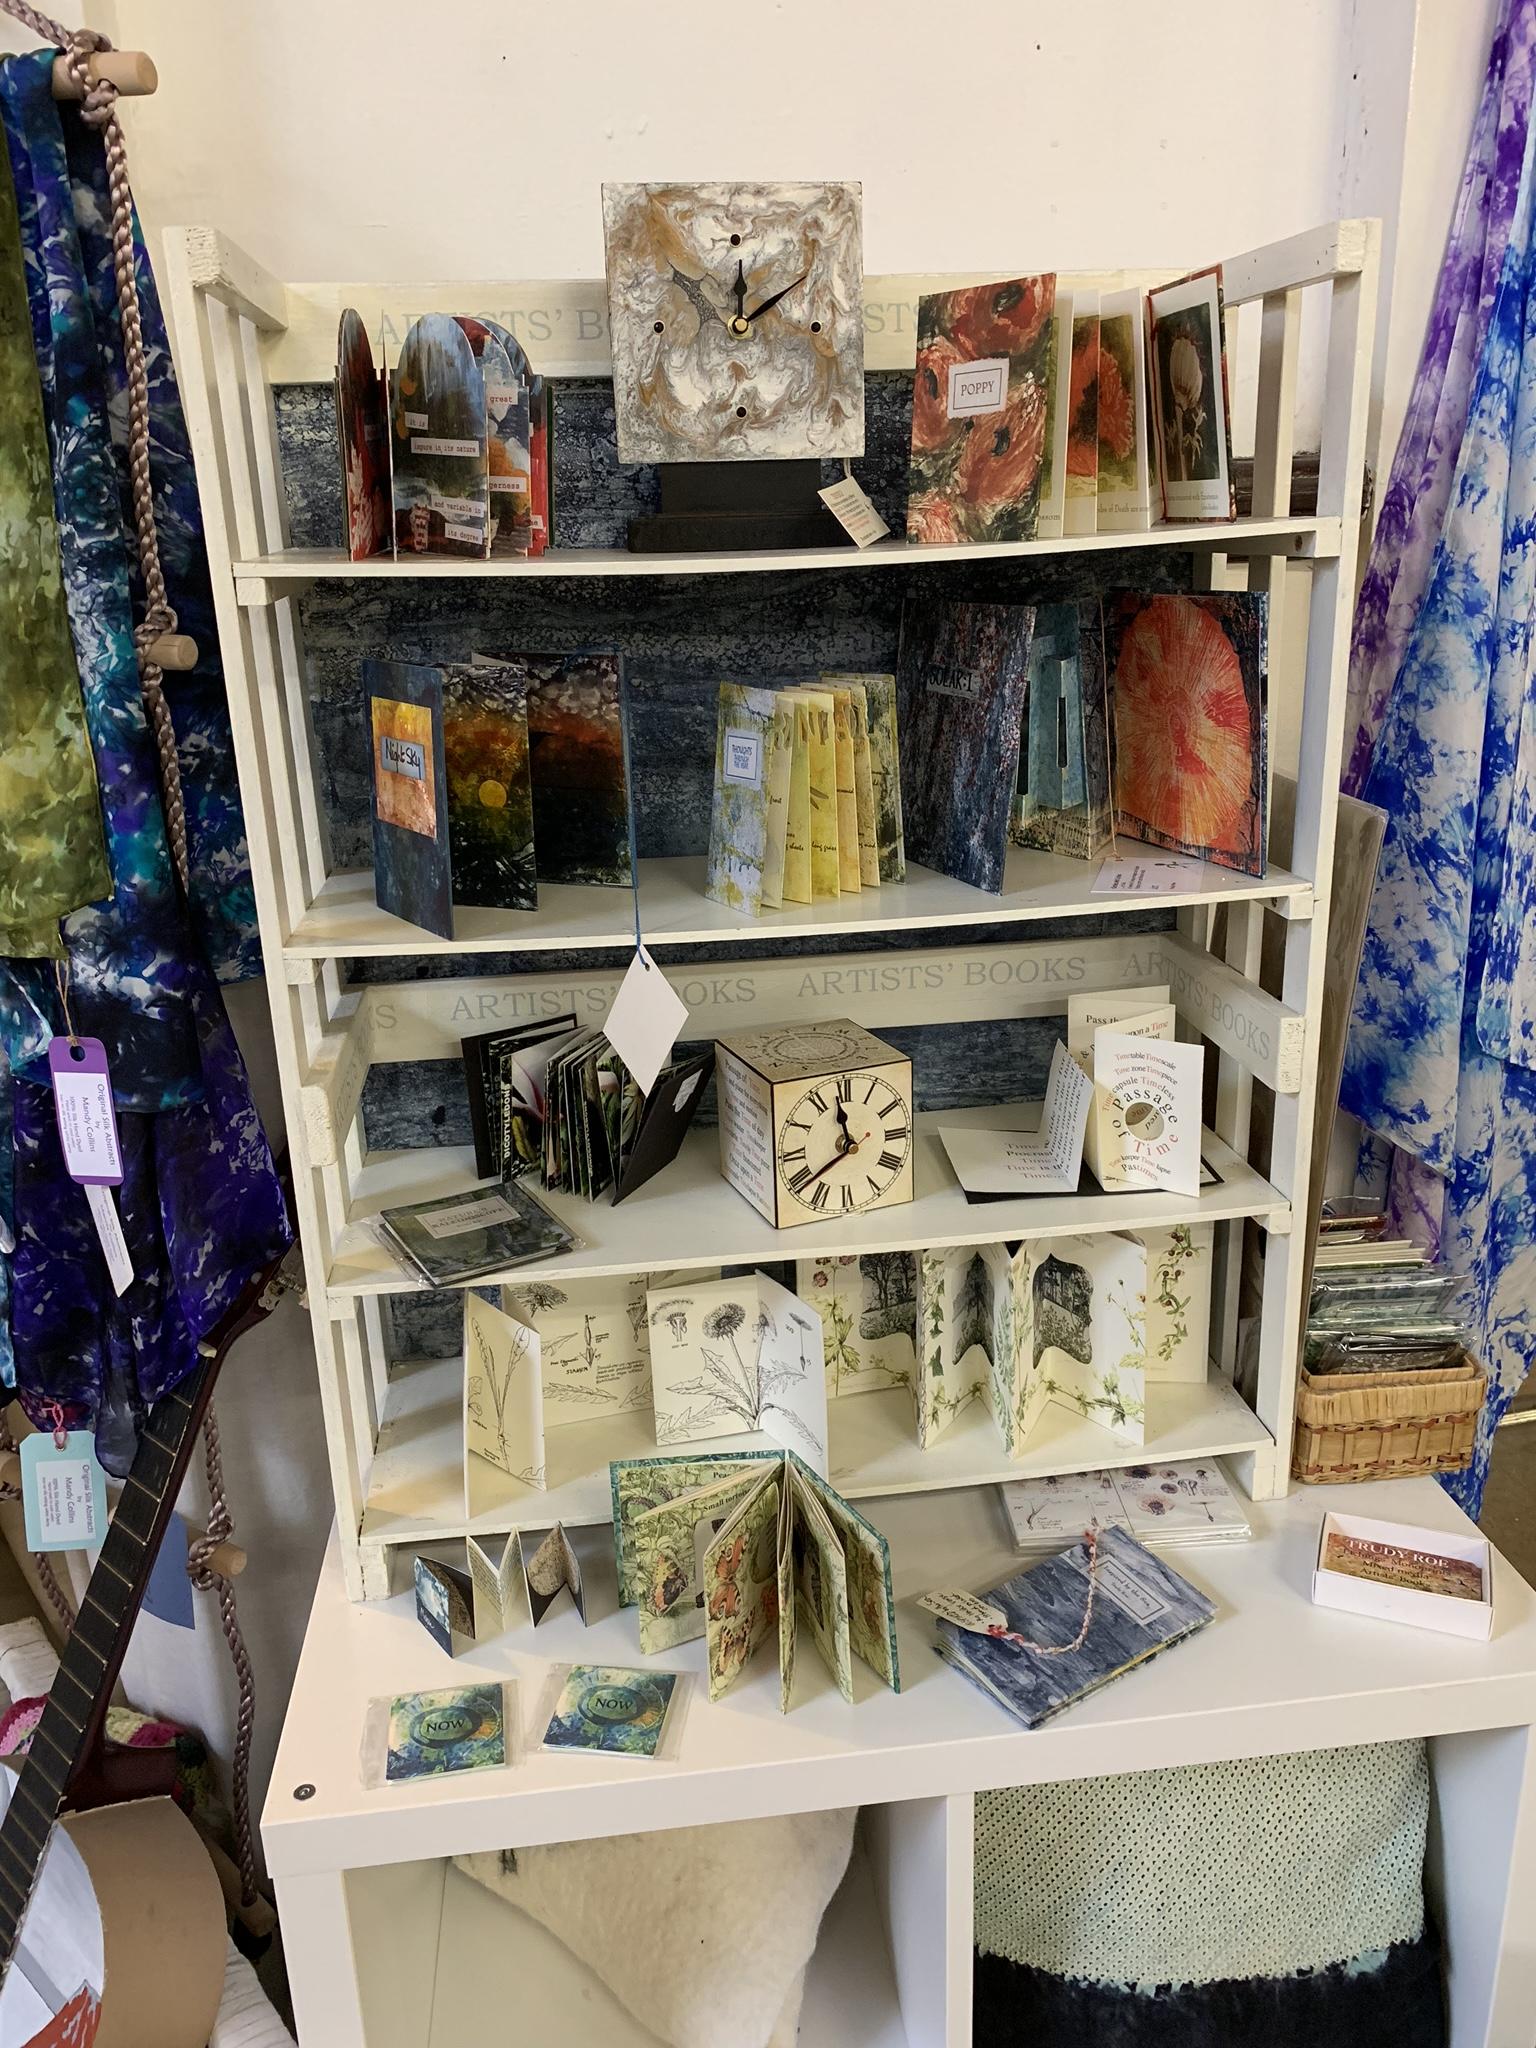 Craft clocks and bookshelf items